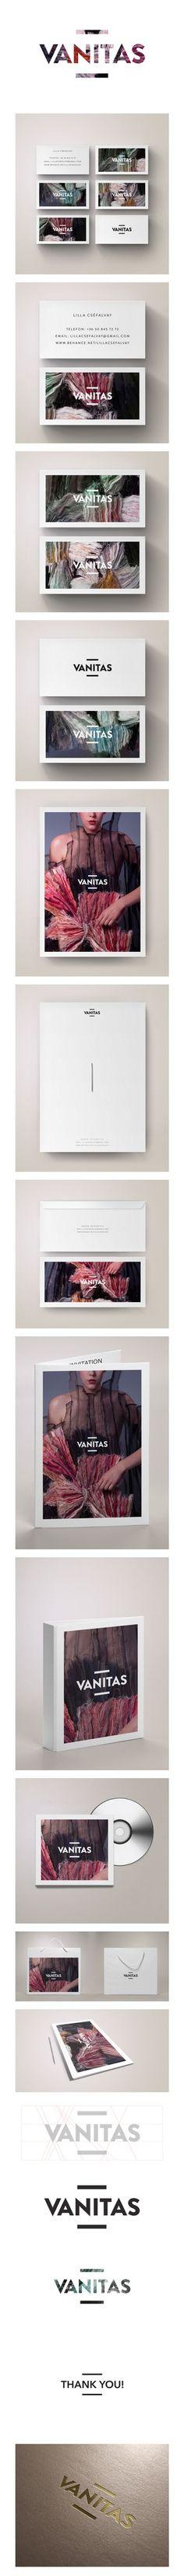 http://designspiration.net/image/1282067050458/